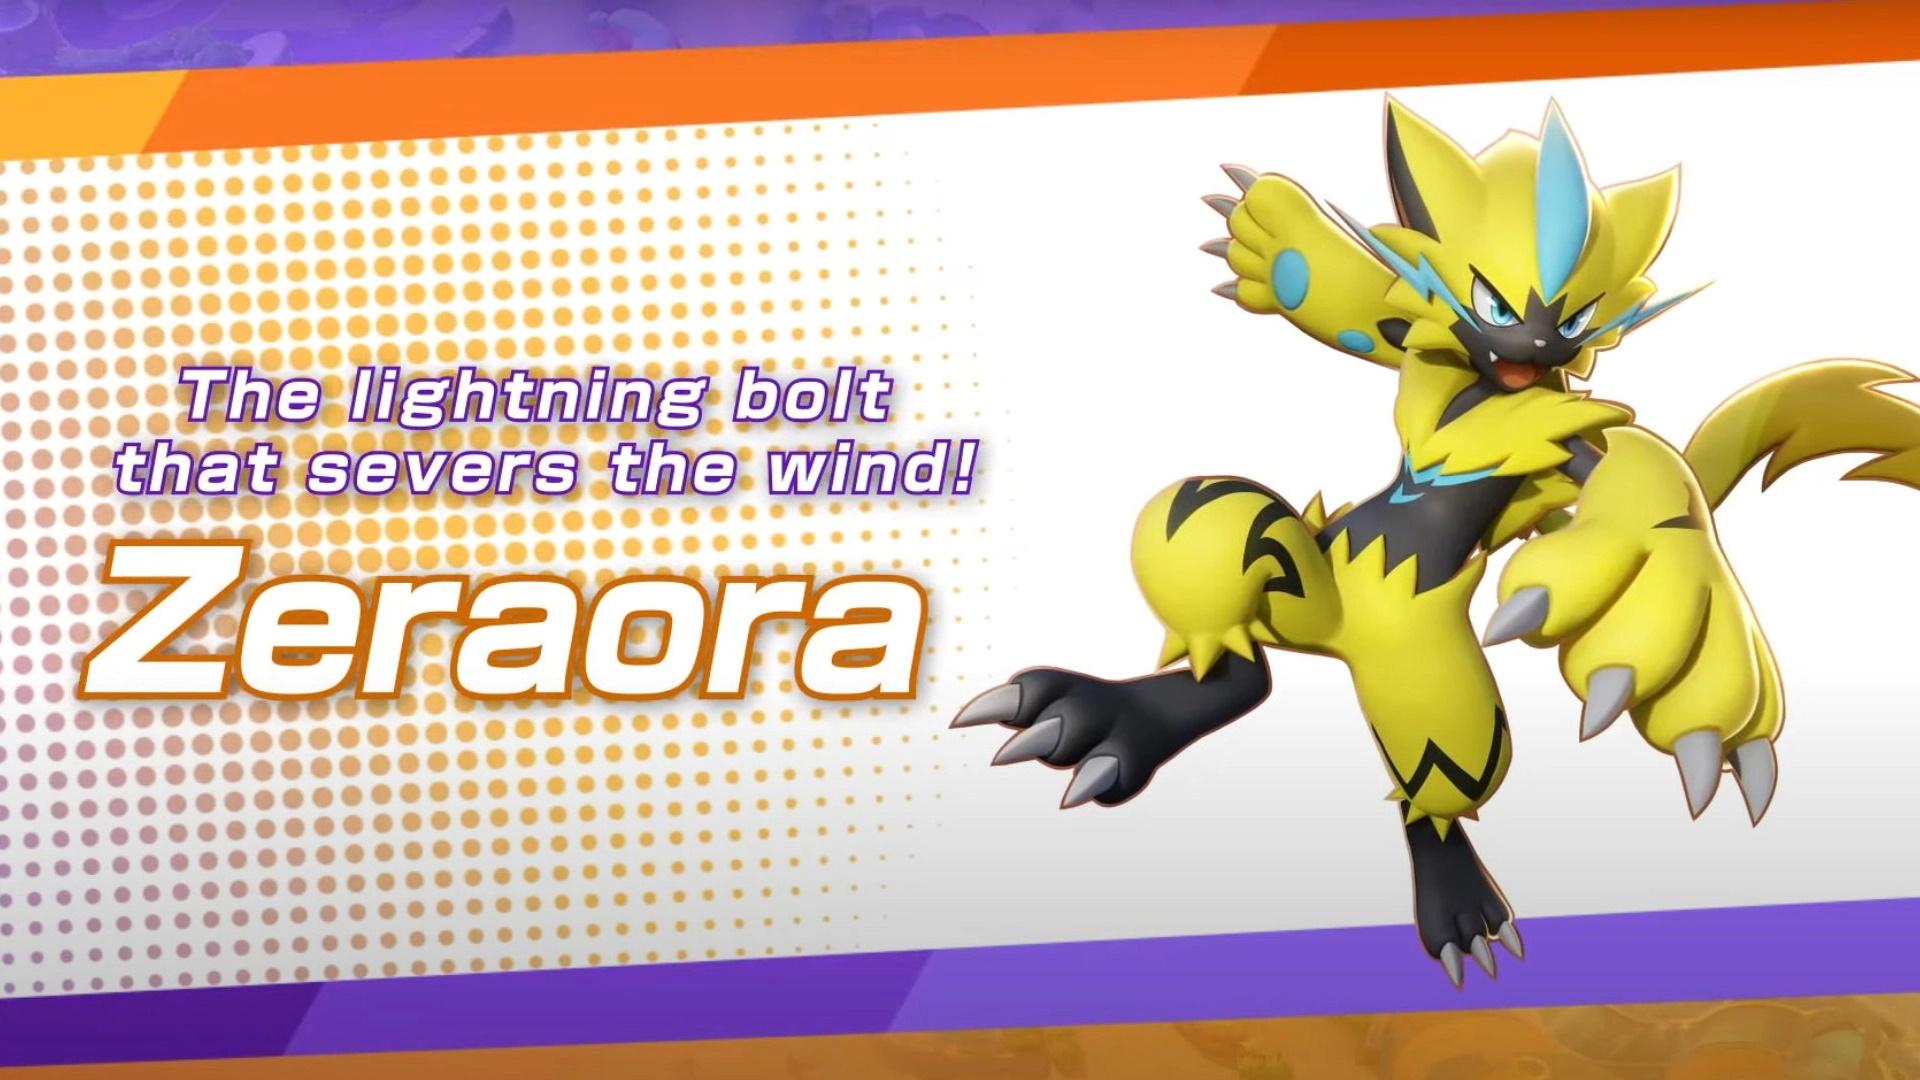 pokemon unite zeraora guide, pokemon unite zeraora moves, pokemon unite zeraora items, pokemon unite zeraora tips, pokemon unite zeraora lane